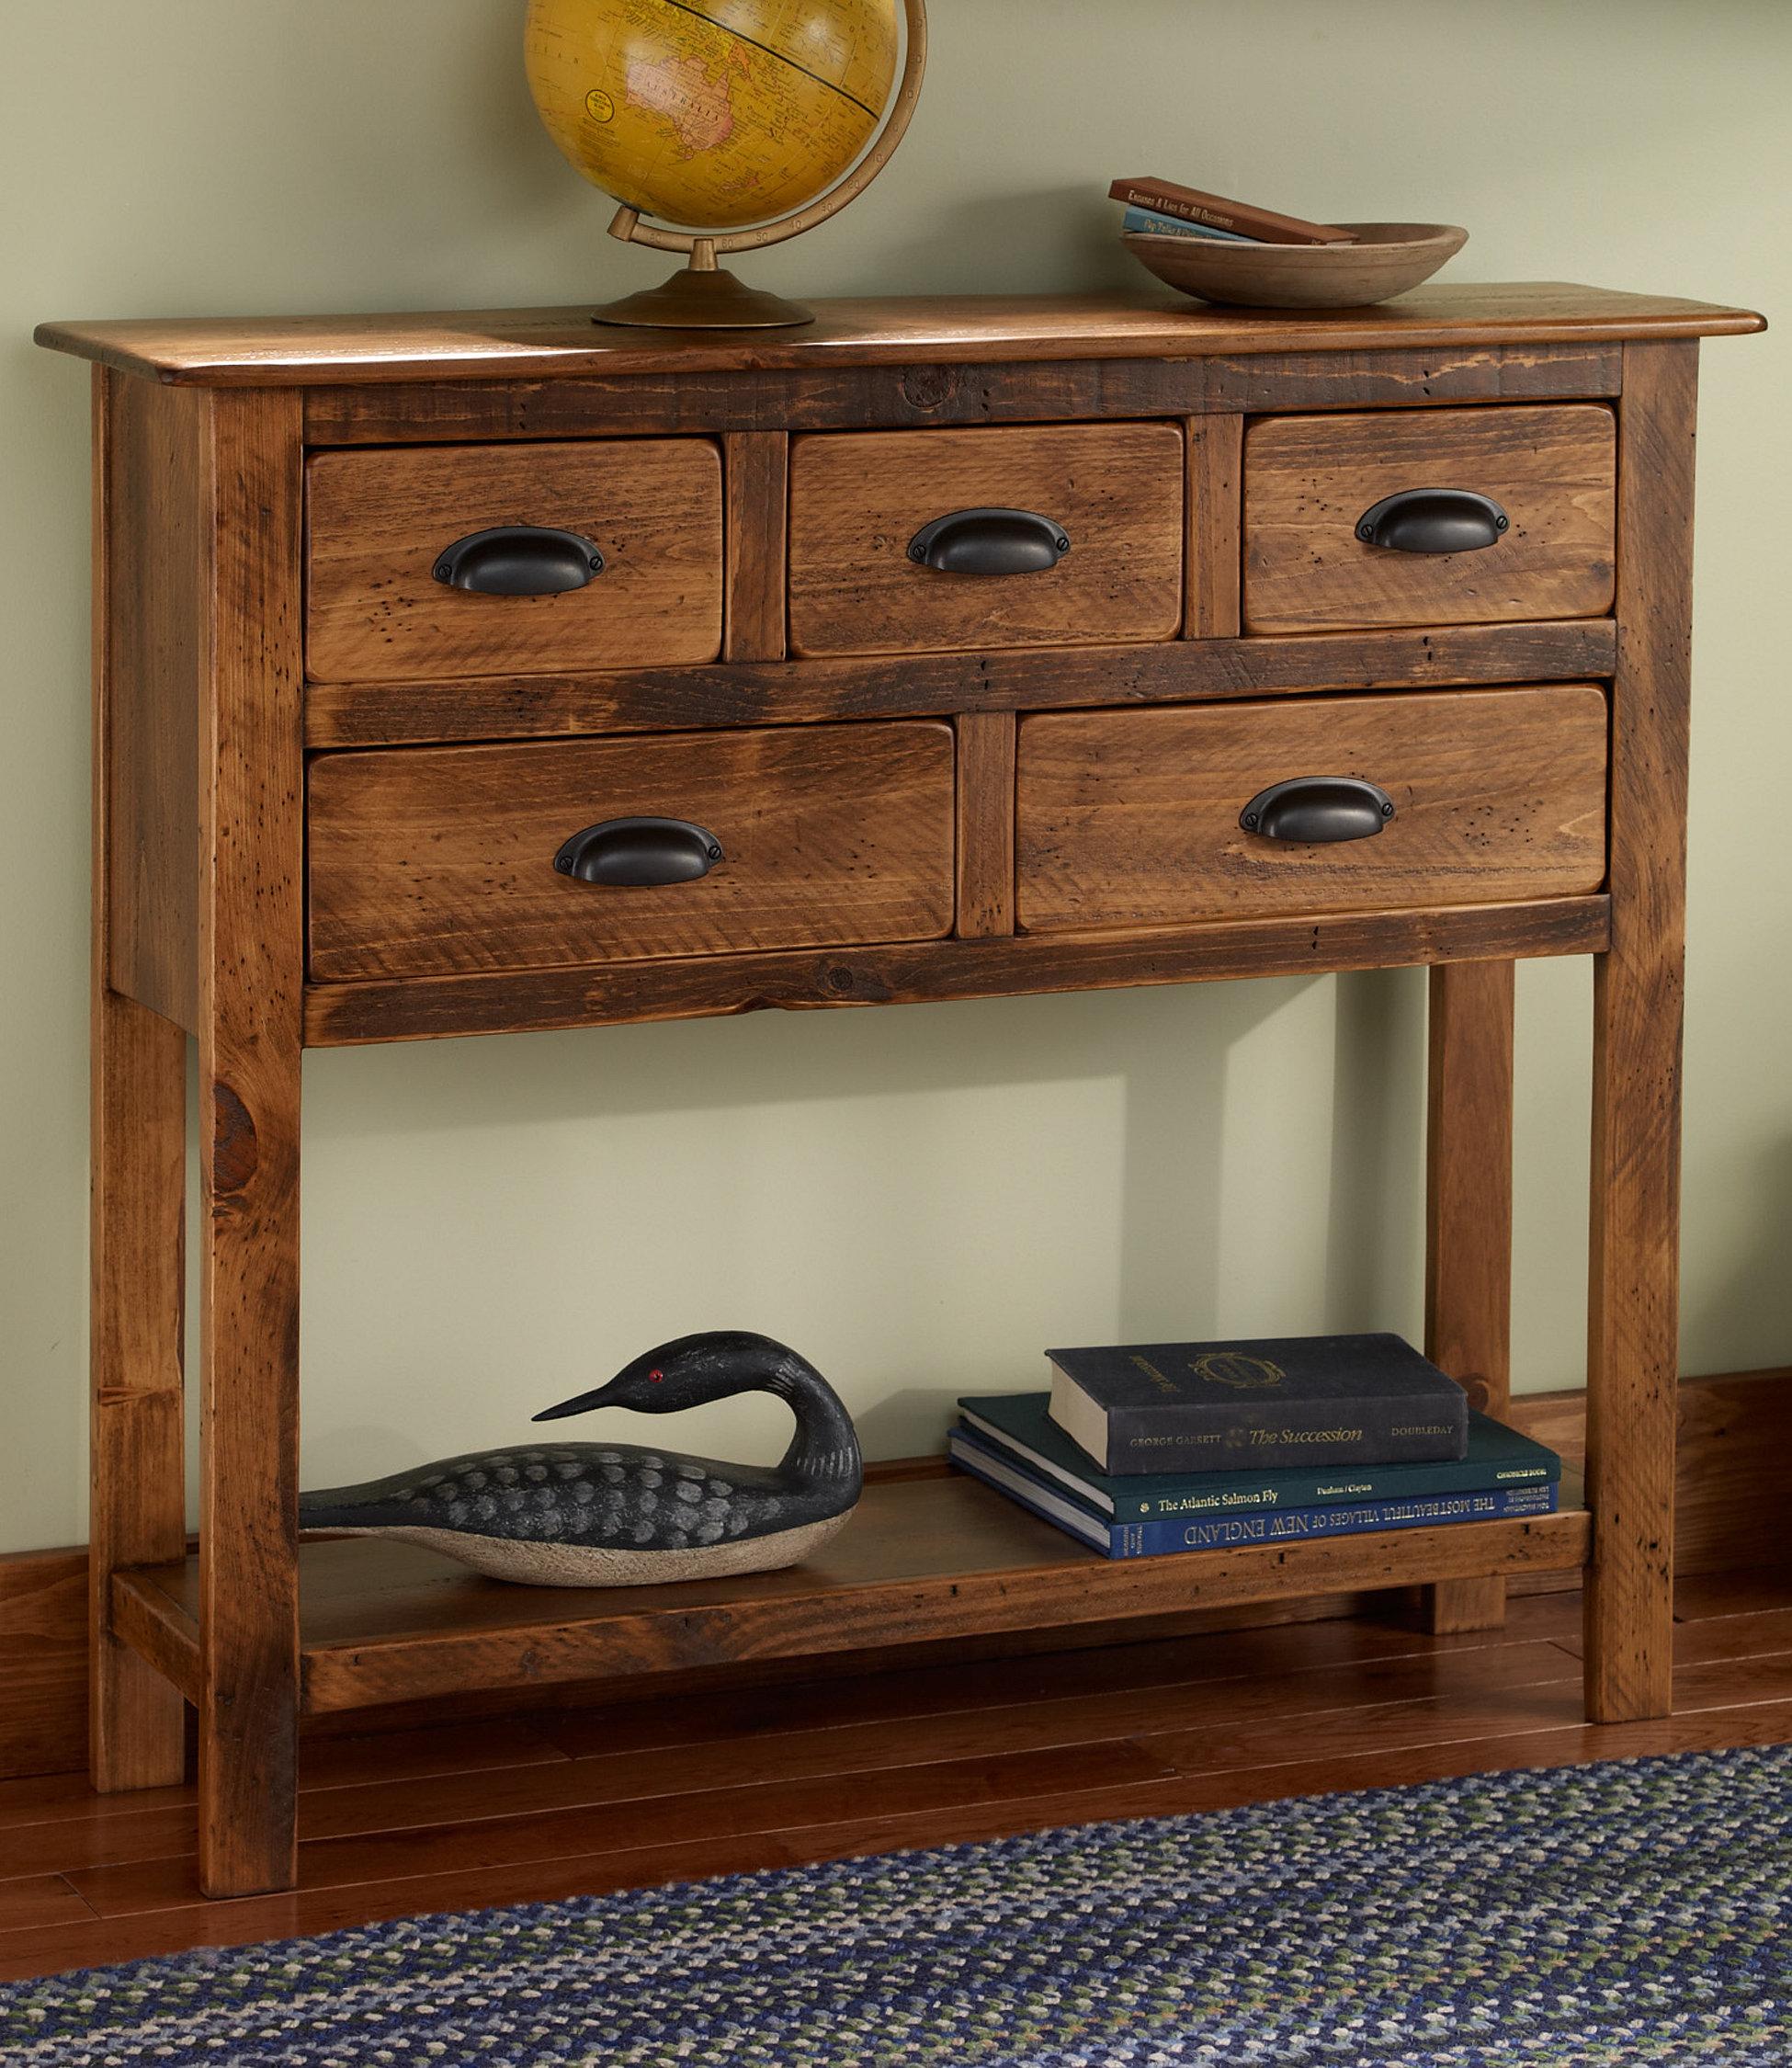 Bon Rustic Pine Console Table 2